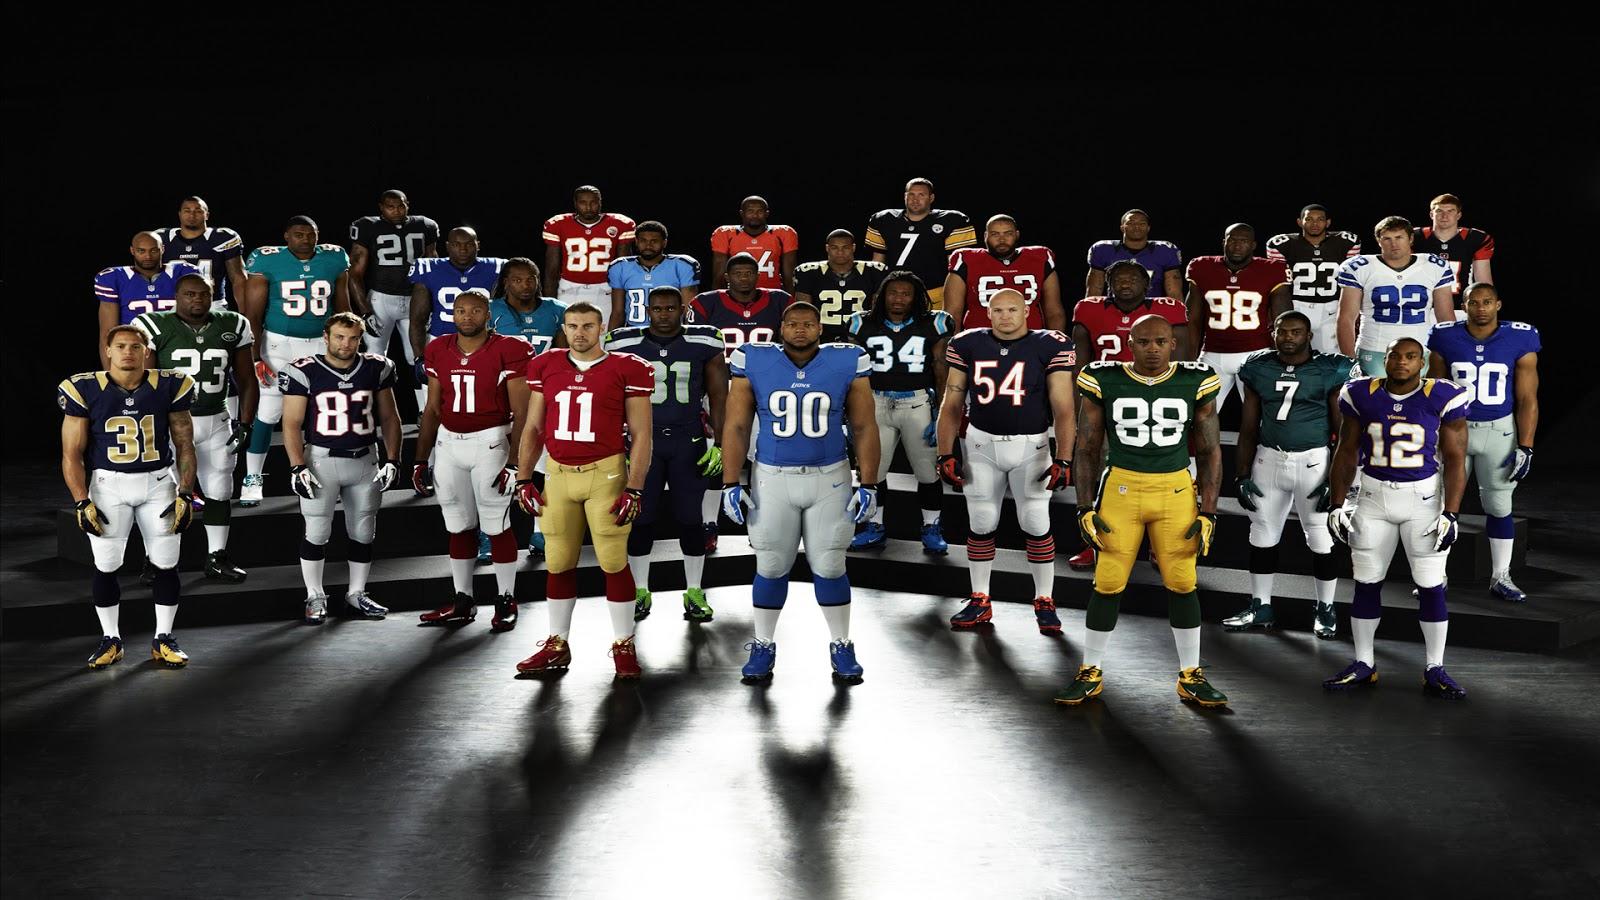 Free Download Nfl Football Hd Wallpapers For: NFL Football Wallpaper Desktop